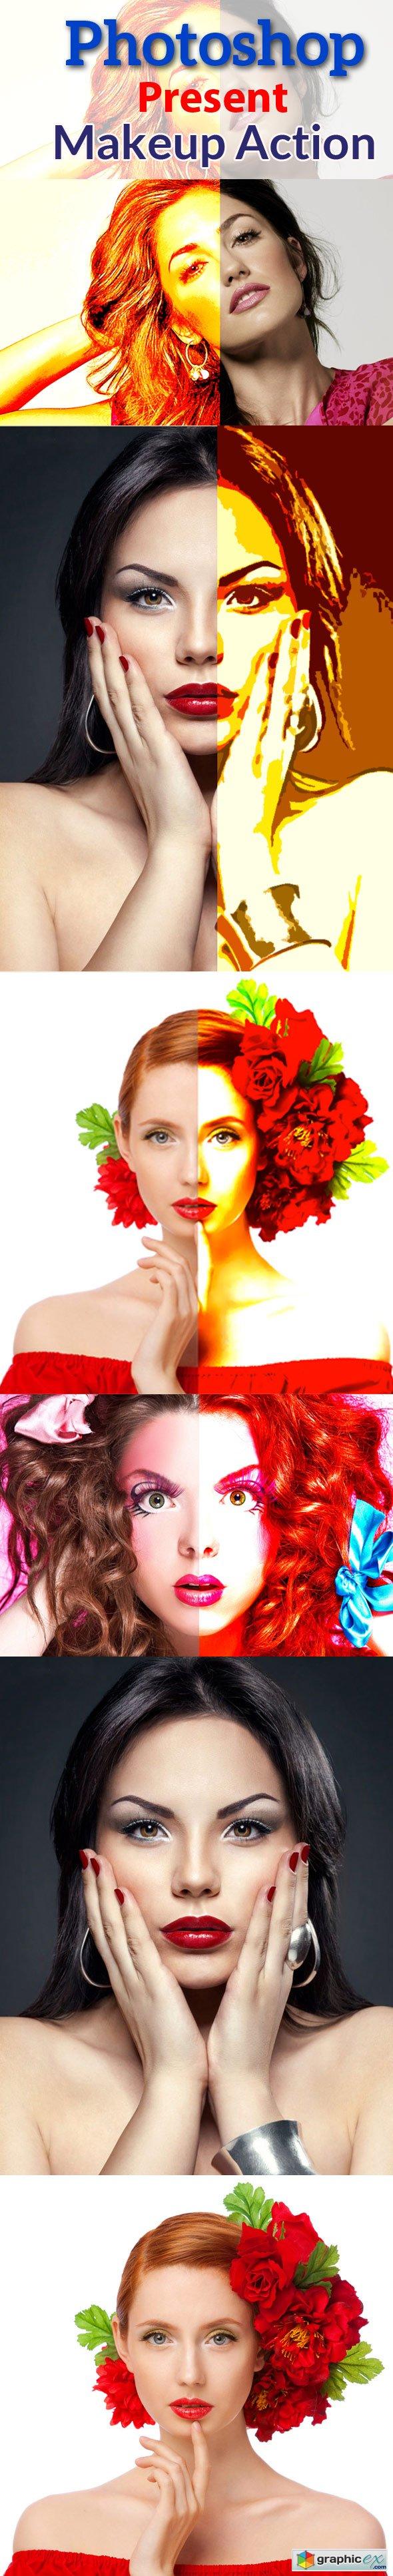 Photoshop Present Makeup Action